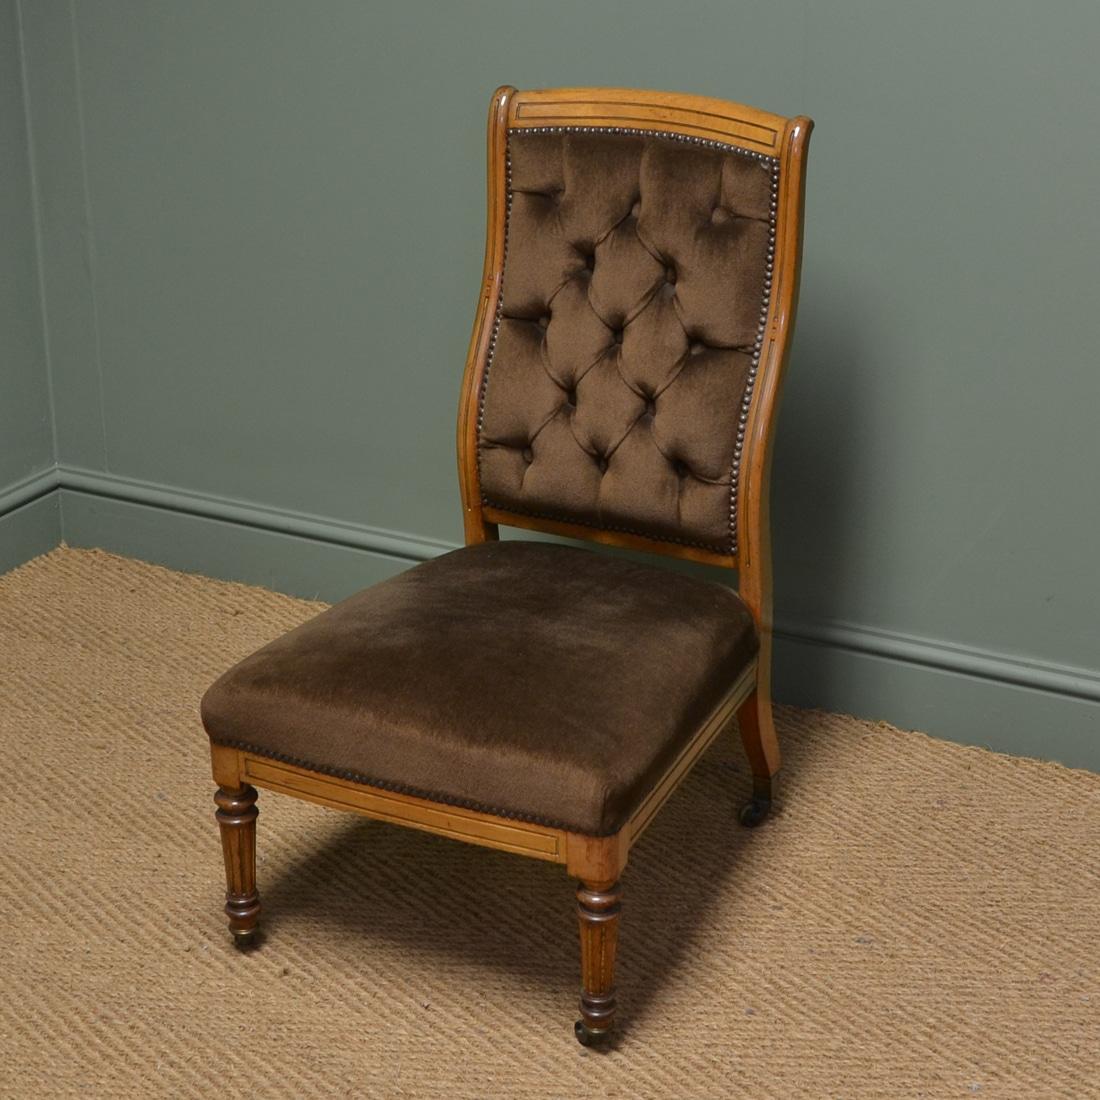 Quality Victorian Mahogany Antique Nursing Chair / Side Chair. - Antiques  World - Quality Victorian Mahogany Antique Nursing Chair / Side Chair